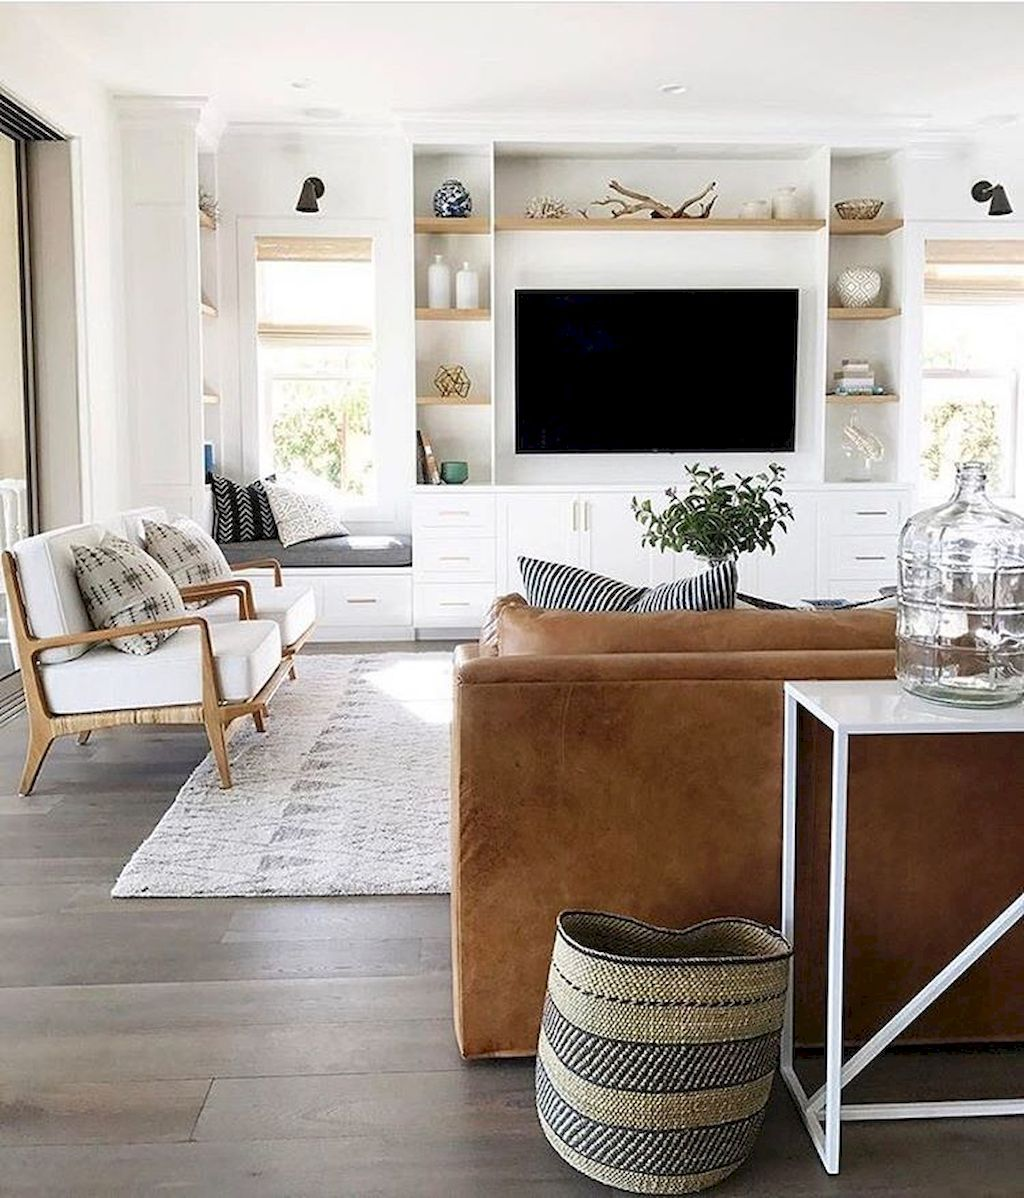 Bon 60 Cozy Minimalist Living Room Design Ideas